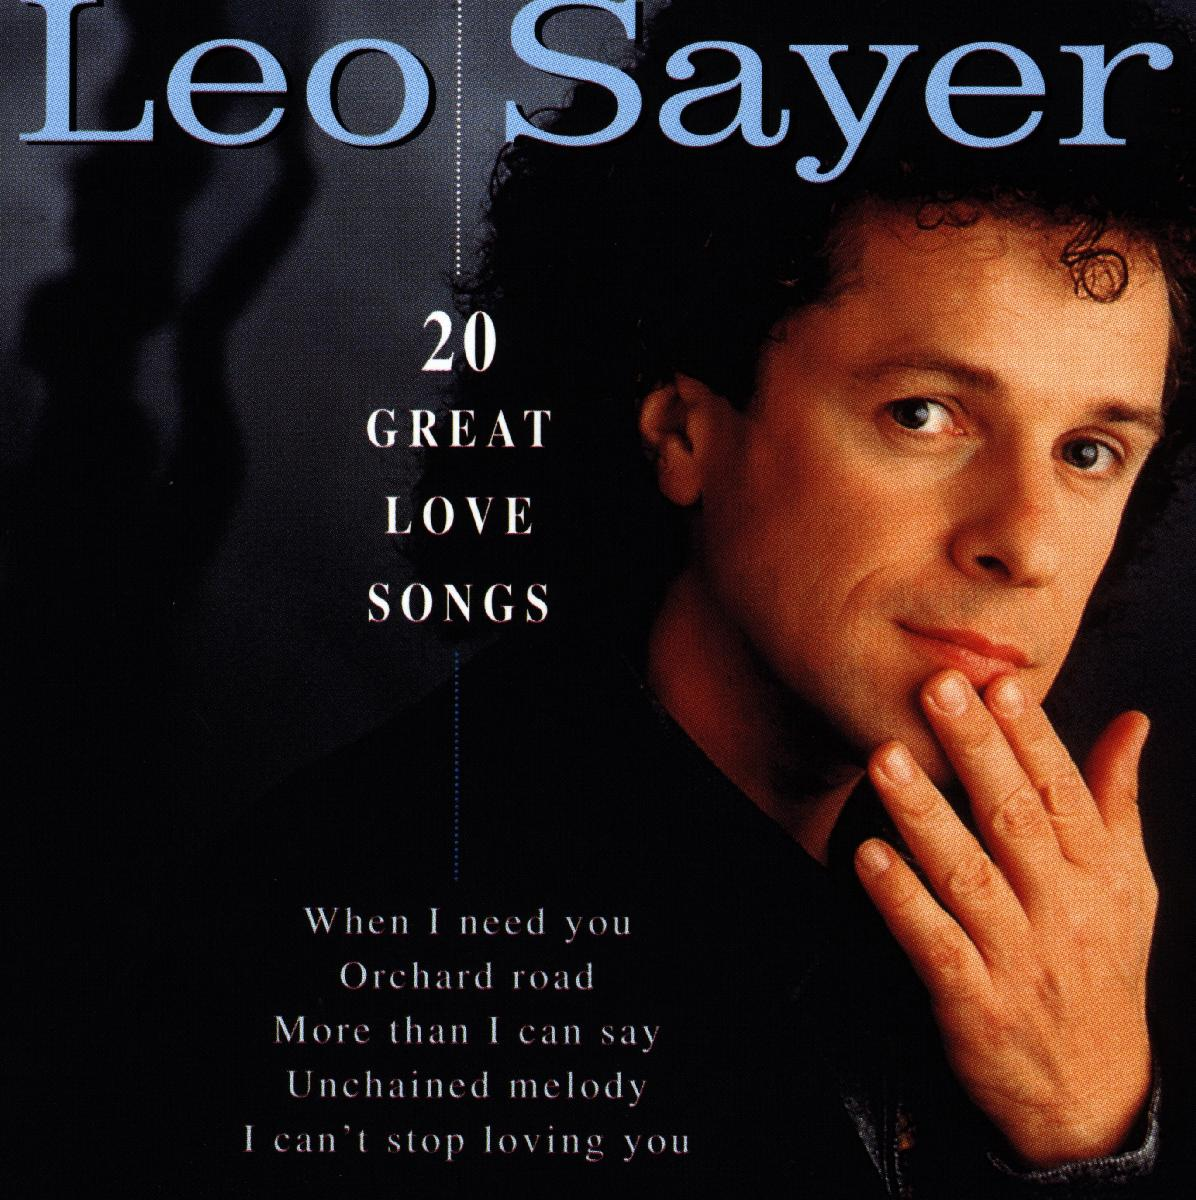 Leo Sayer - 20 Great Love Songs - Sayer Leo - Musik - Disky (Disky) - 0724348705822 - 2/2-1998